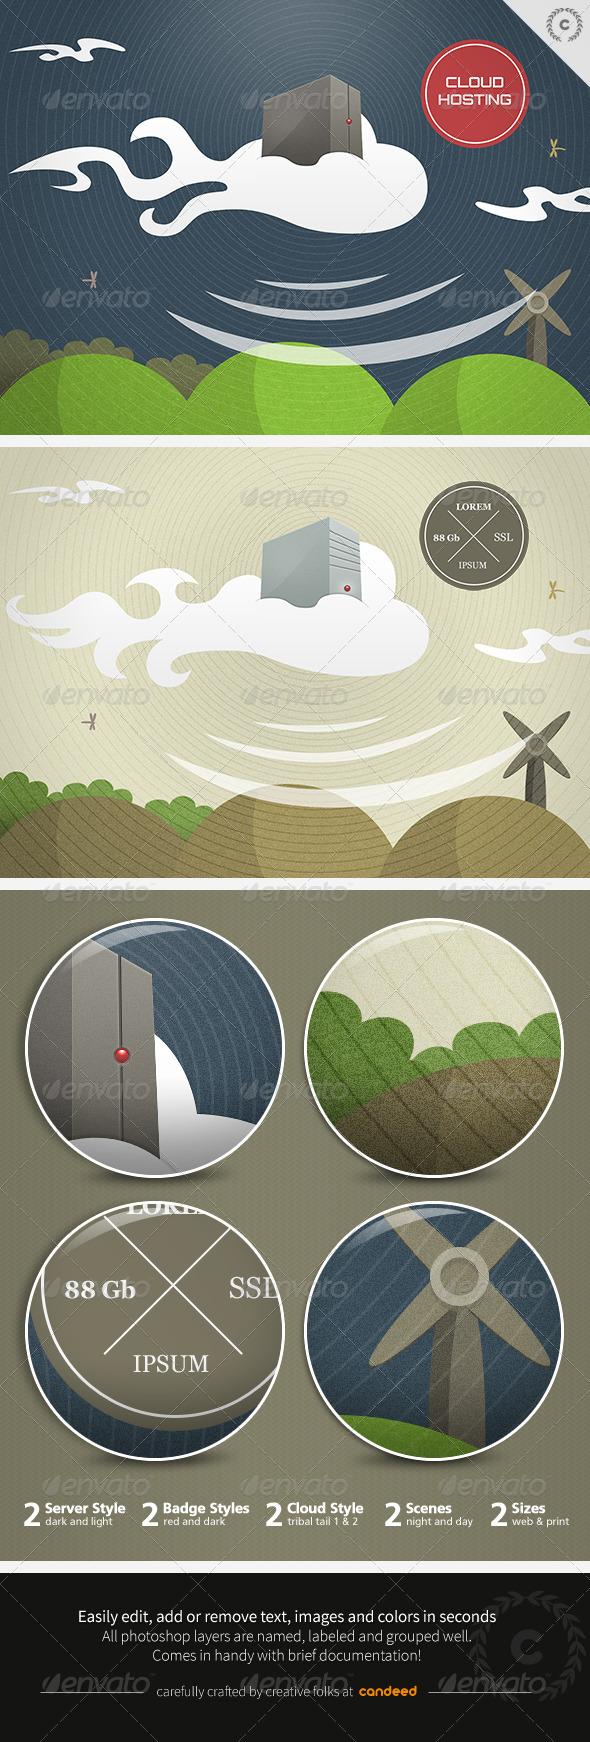 Cloud Hosting Technology Illustration - Business Illustrations